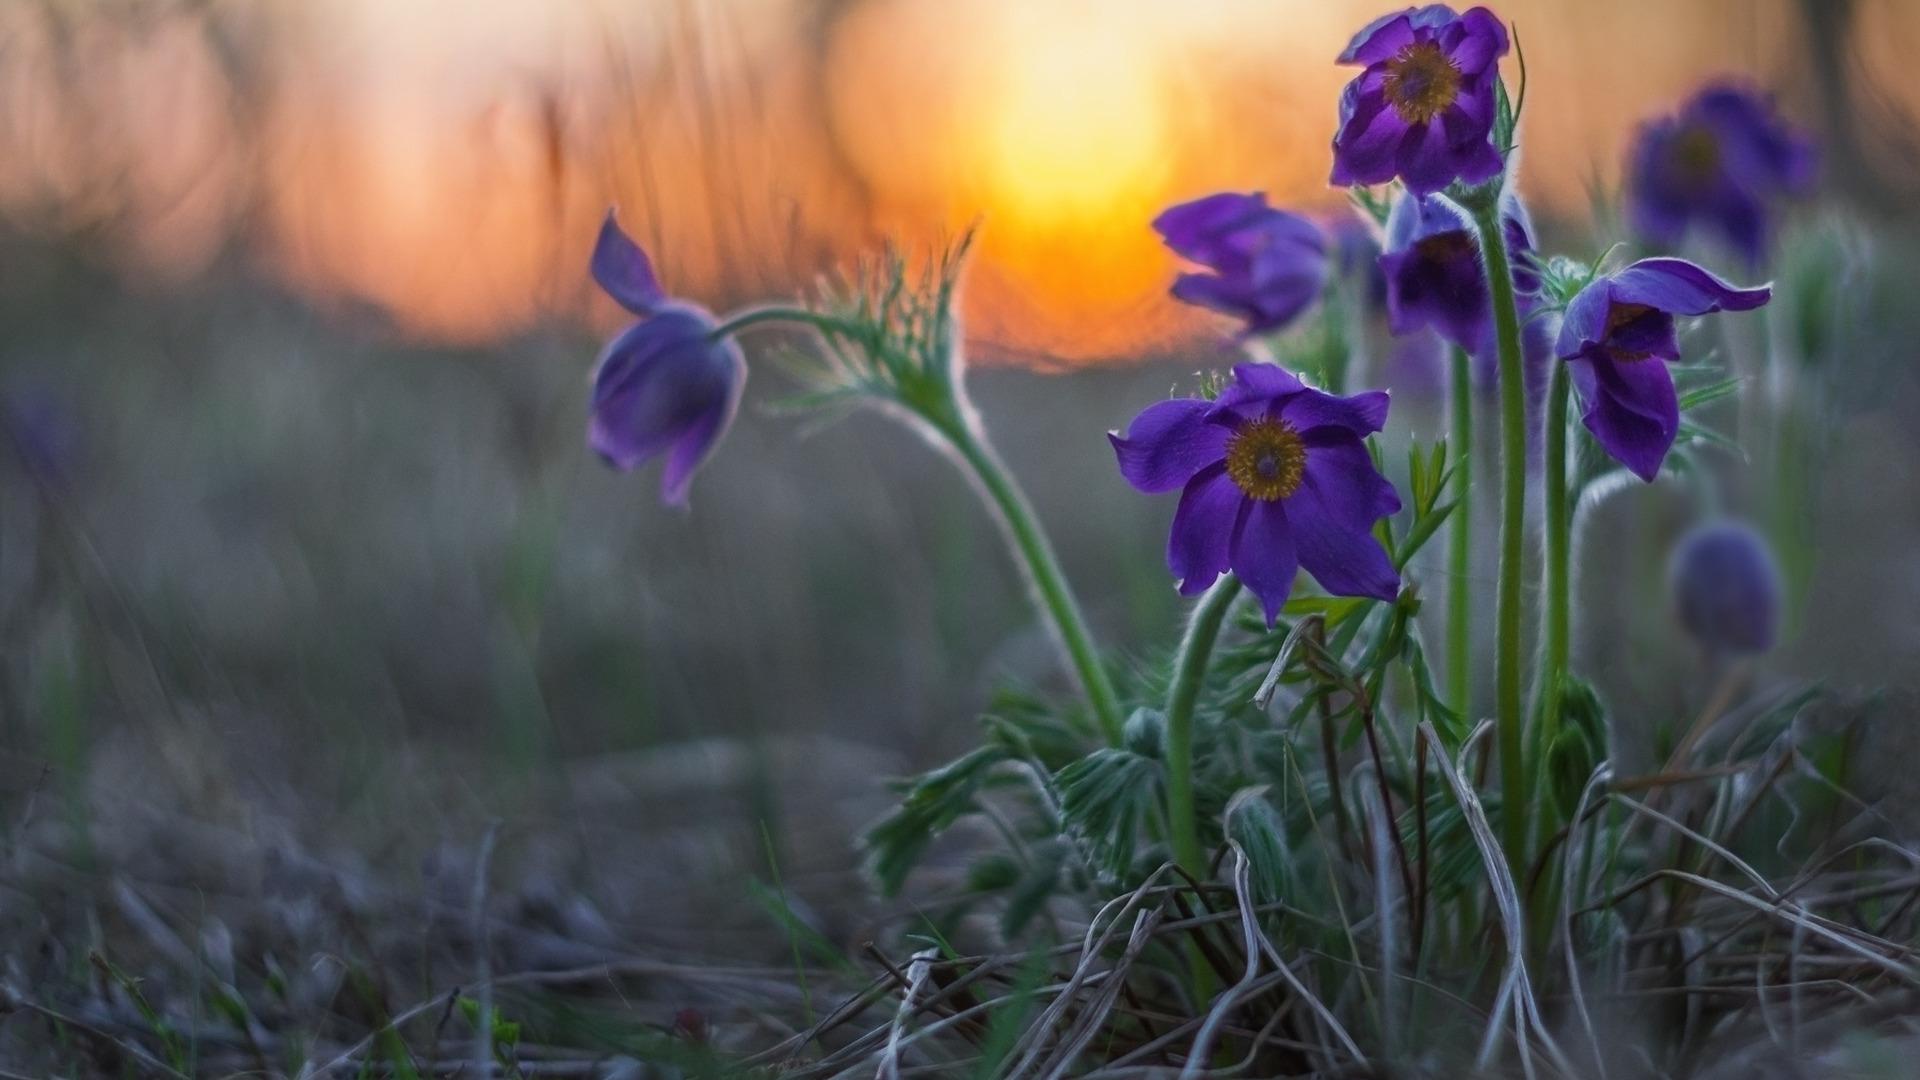 Картинка подснежника сон трава